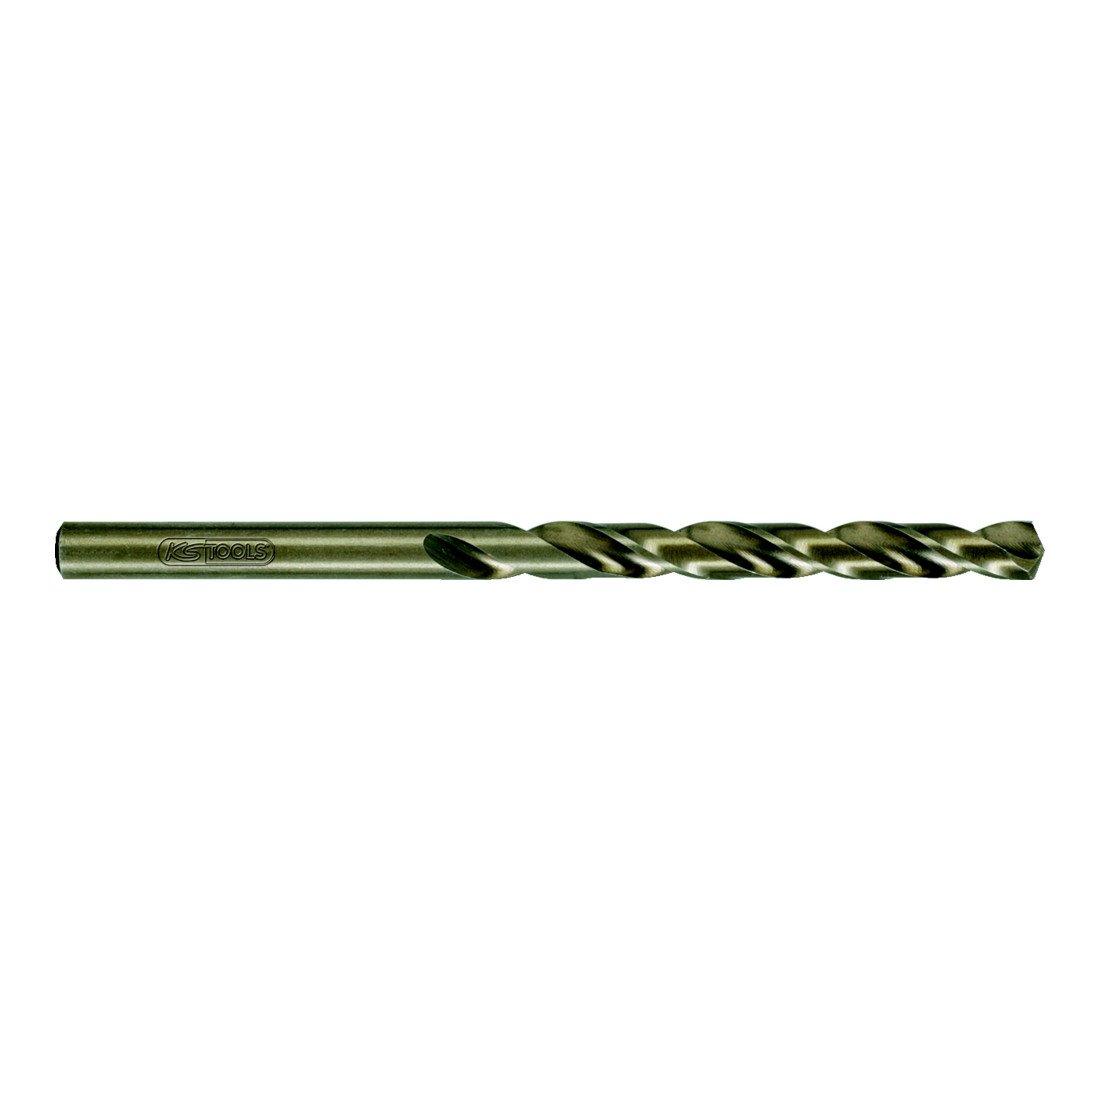 HSS-G Co 5 twist drill pack of 10 4,8mm